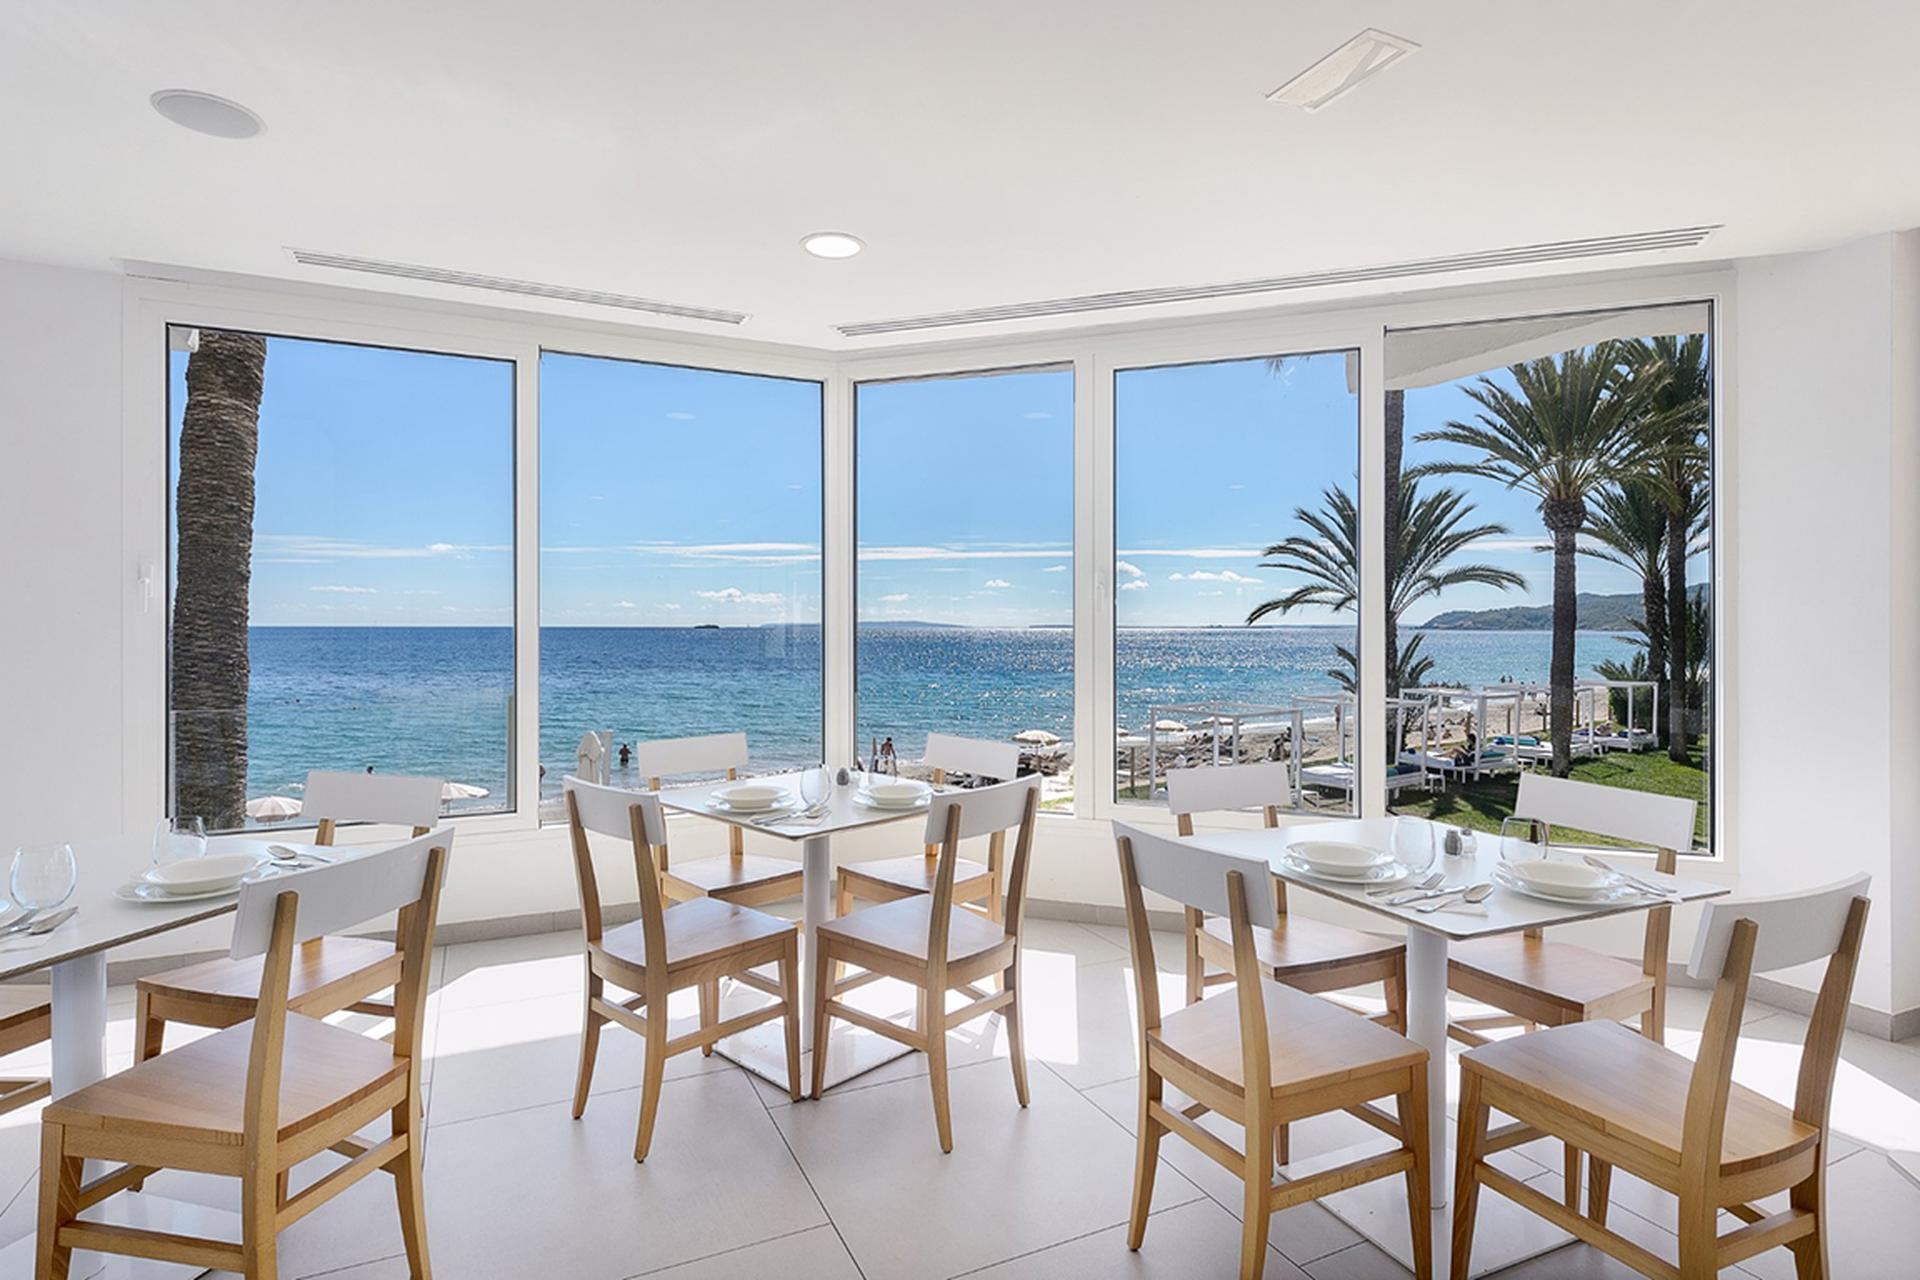 Hotel Playasol The New Algarb Ibiza